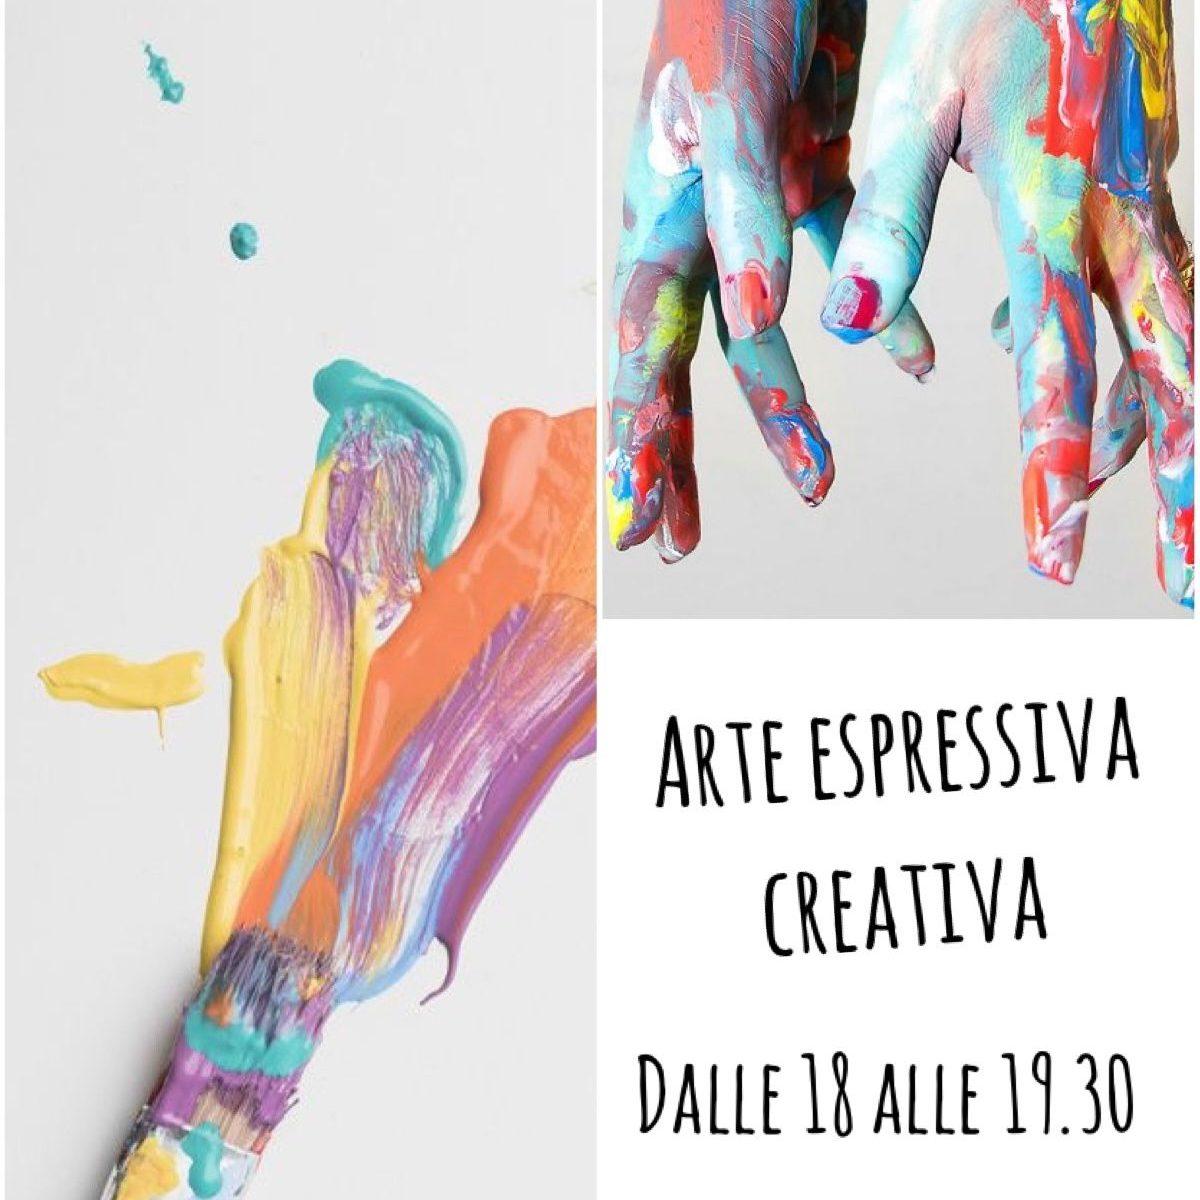 Arte Espressiva Creativa